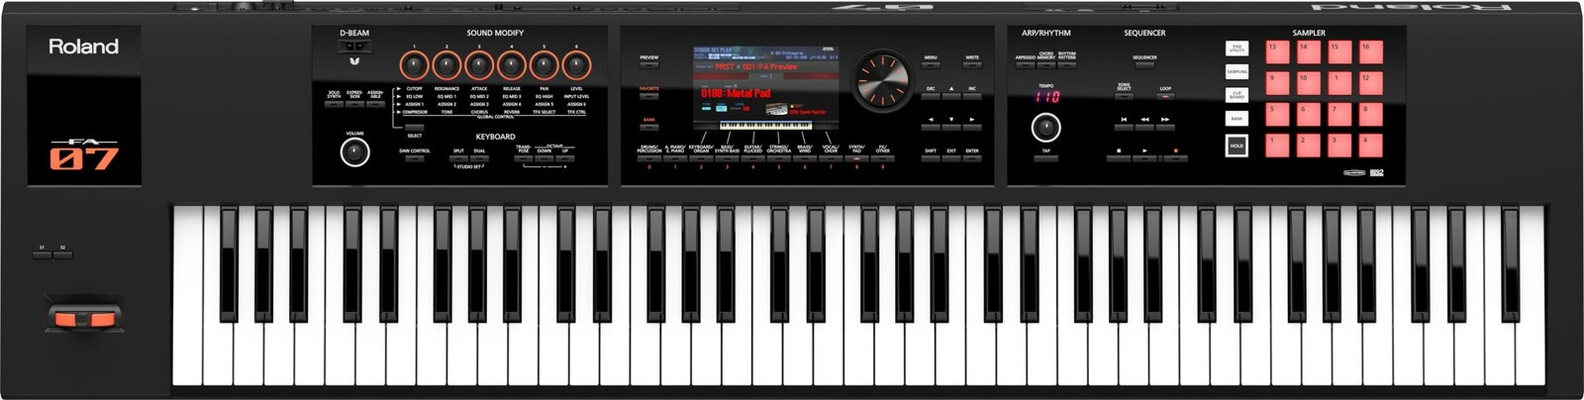 Roland FA-07 Music Workstation